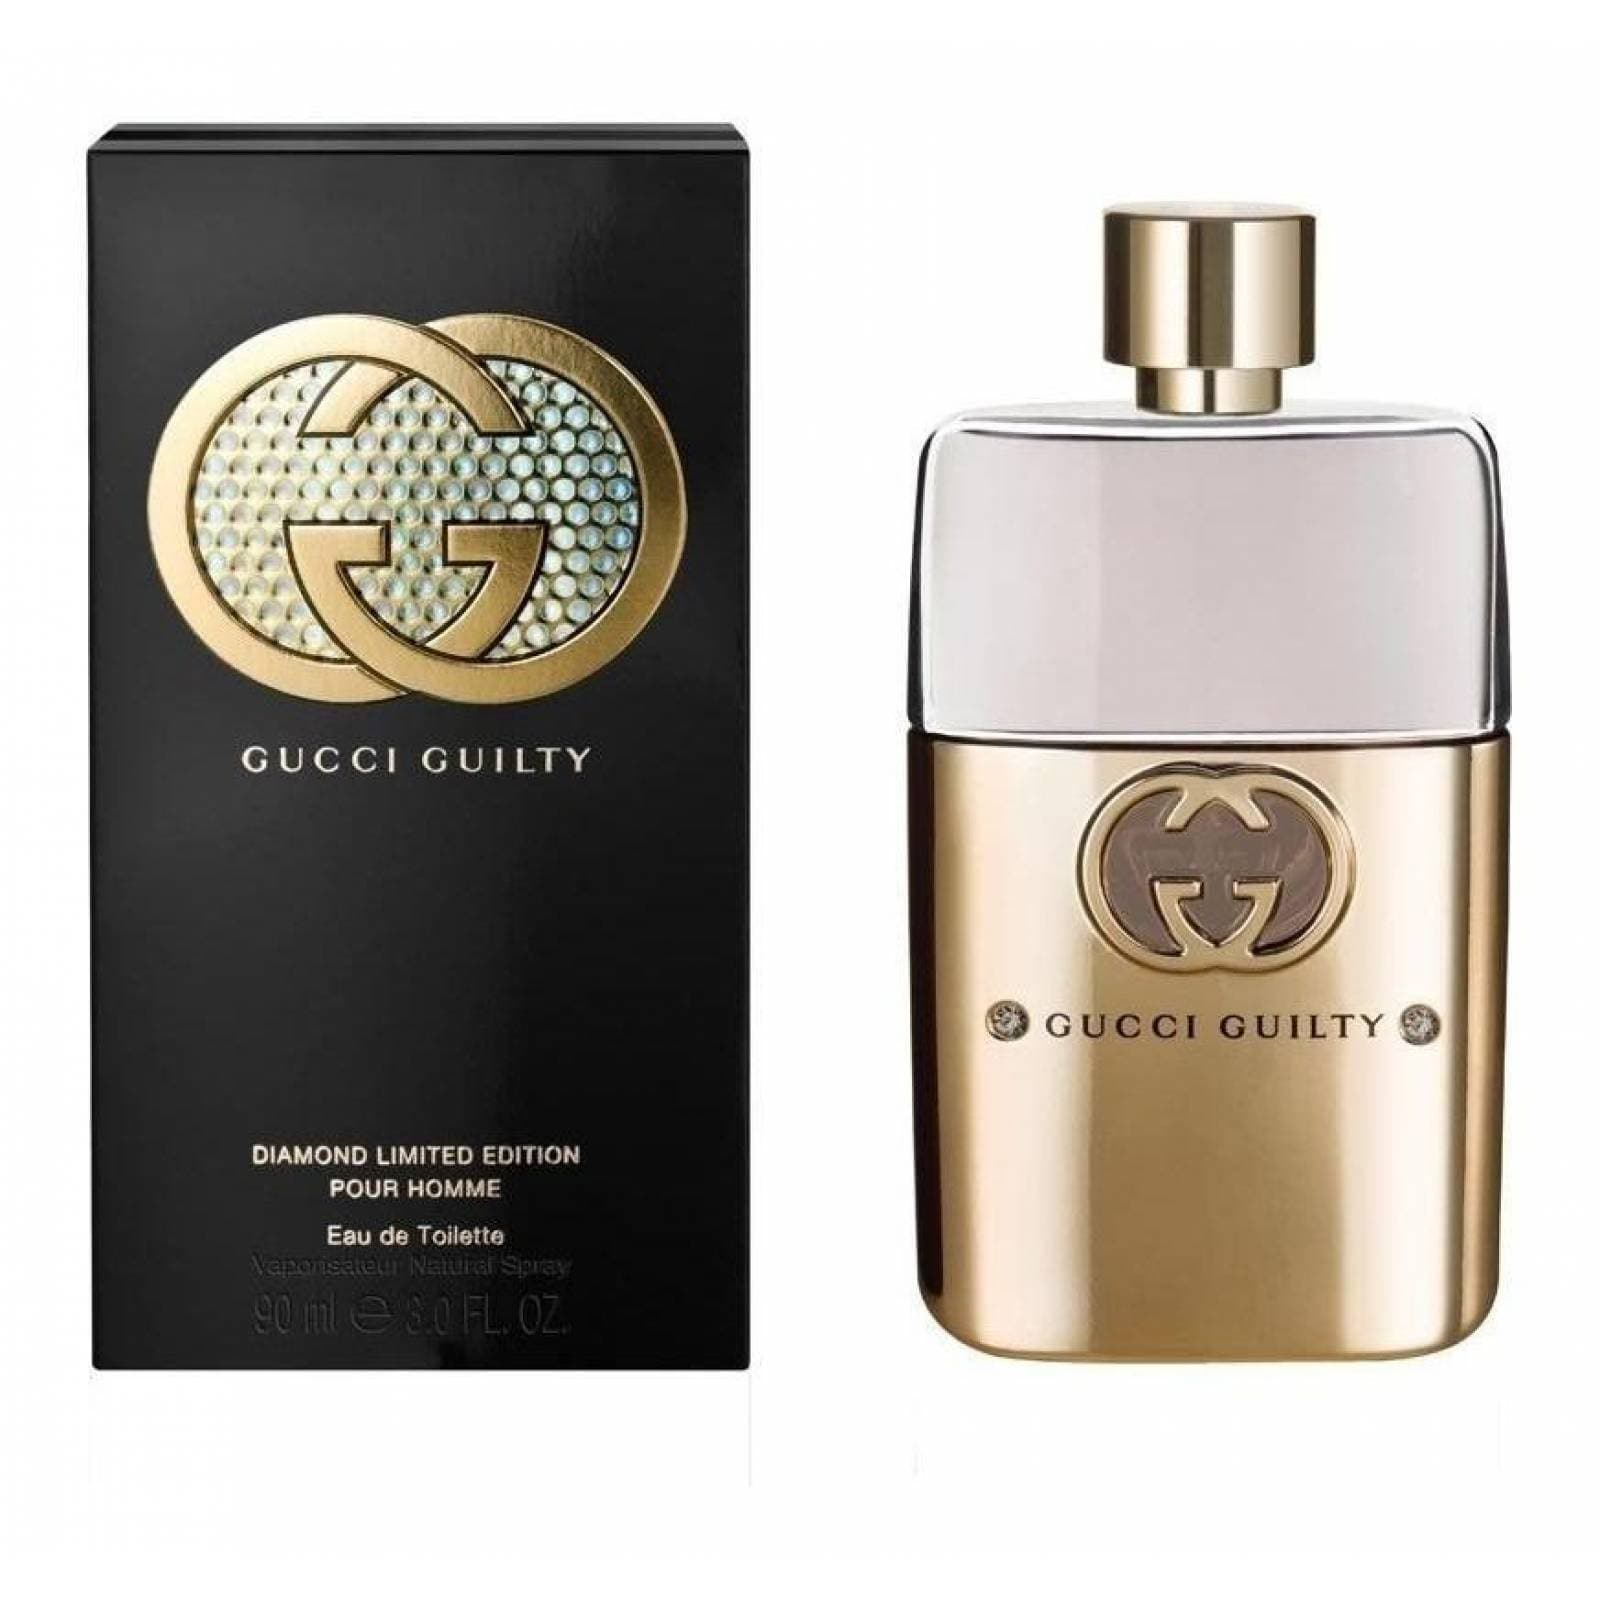 Guilty Diamond Limited Edition de Gucci Caballero de 90 ml